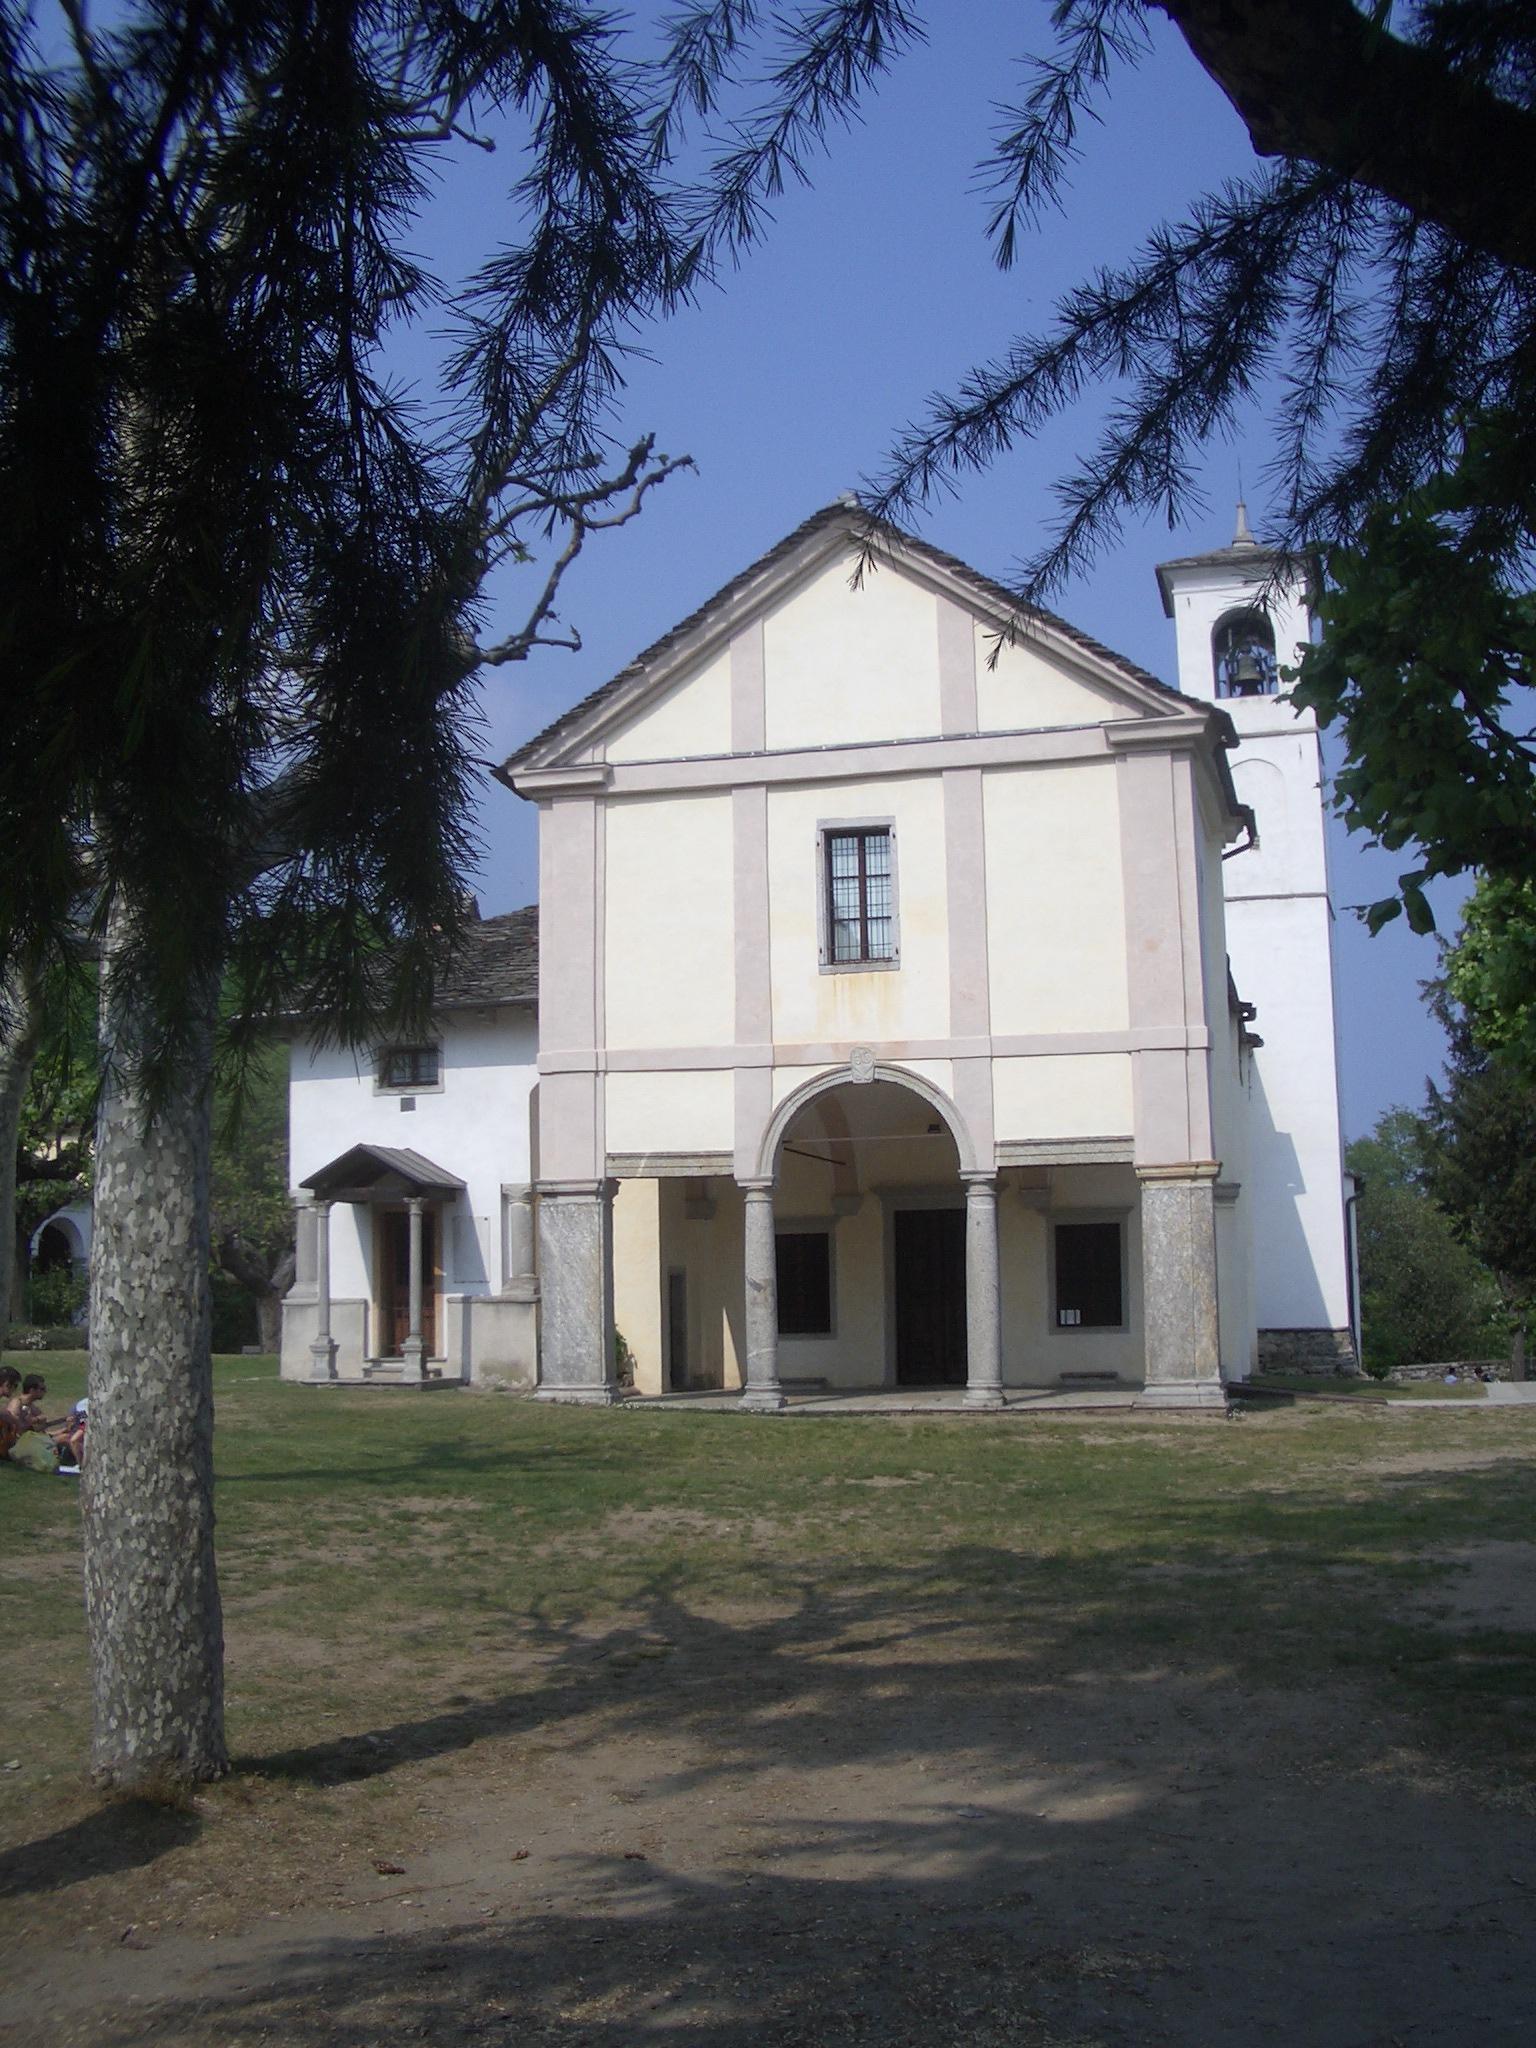 Ghiffa Italy  city photos gallery : Sacro Monte Ghiffa Santuario Trinità Wikipedia